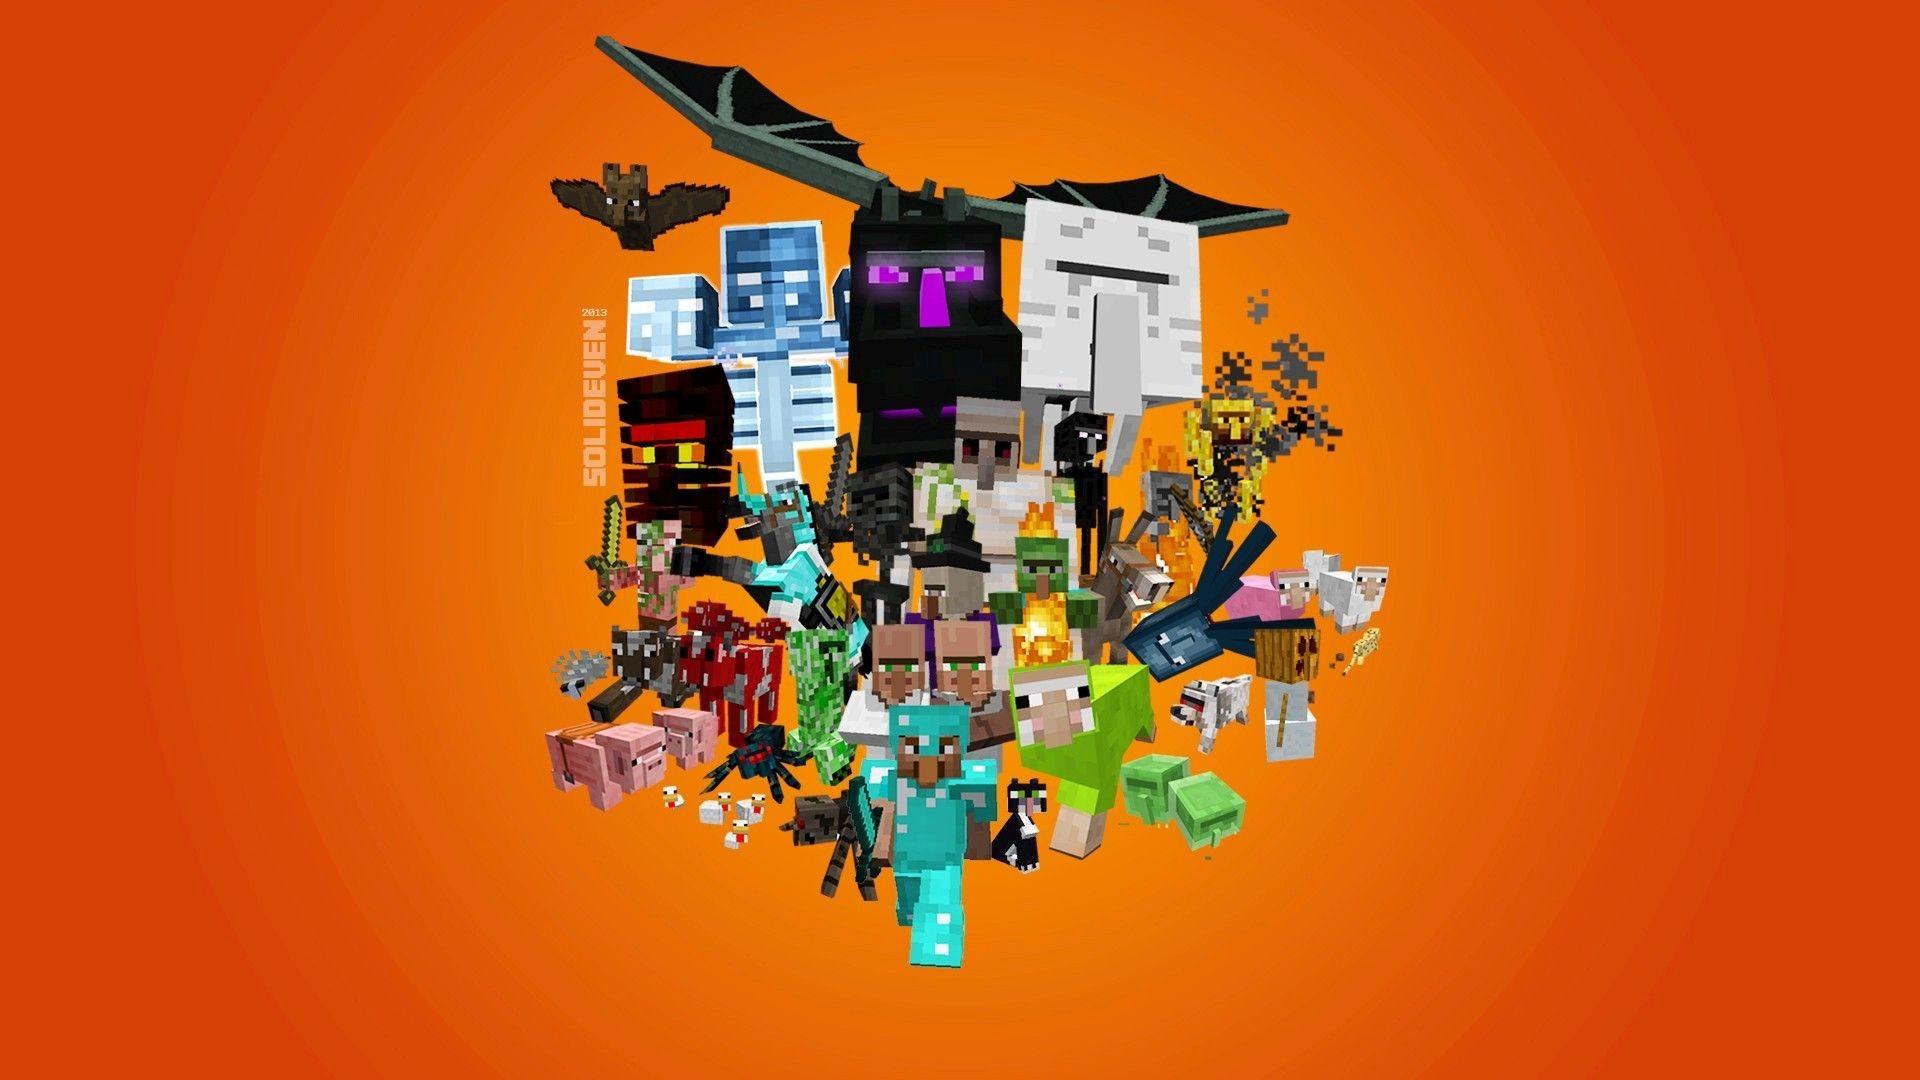 Minecraft Herobrine wallpapers wide